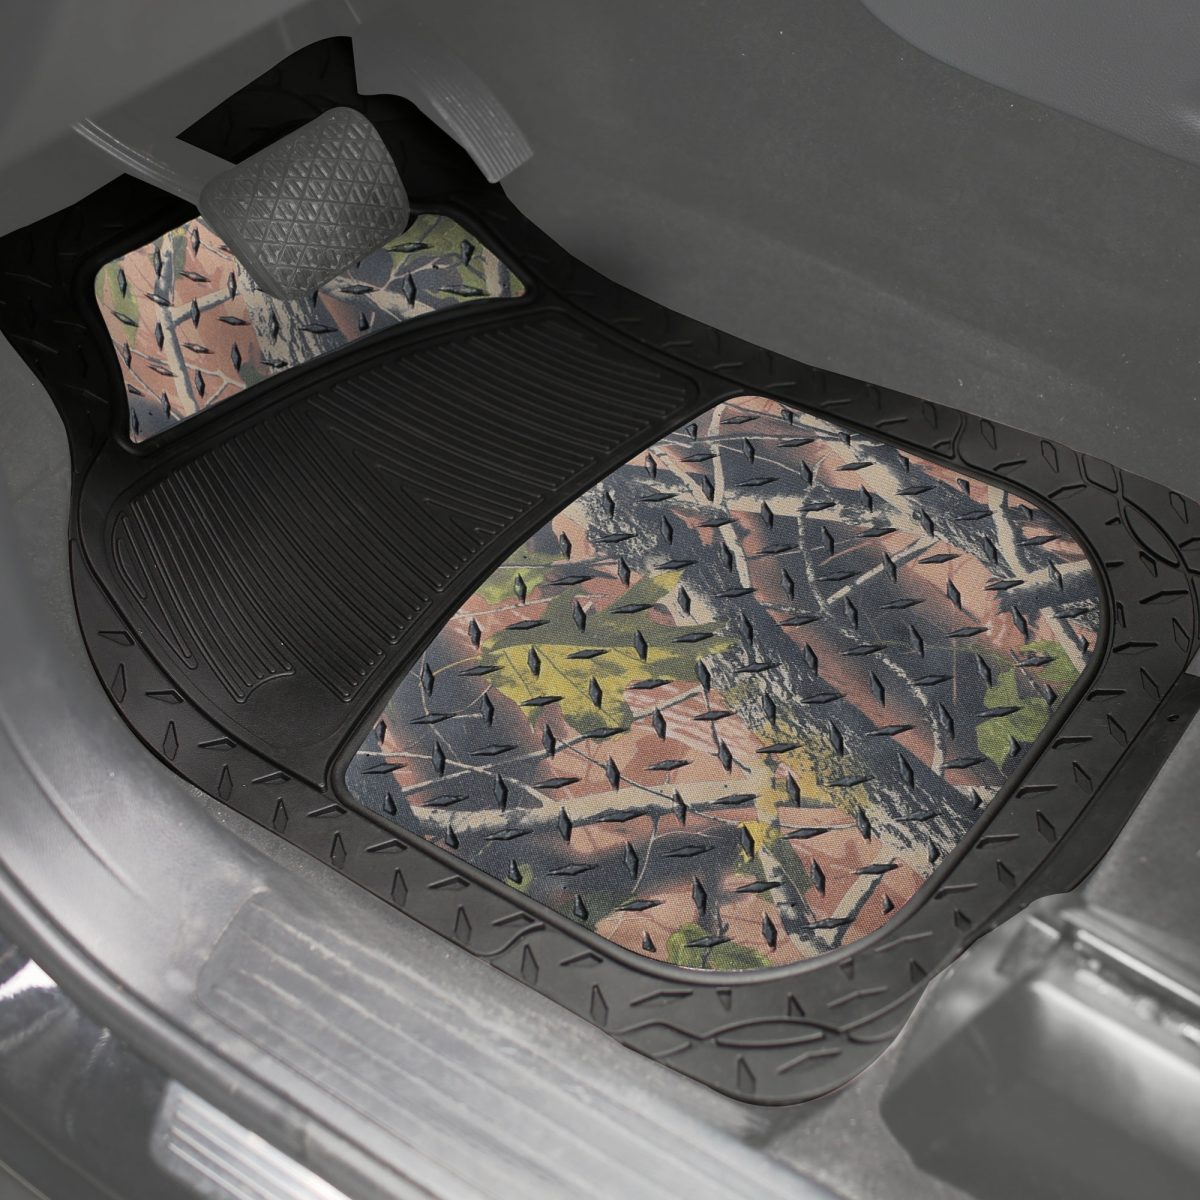 f11312_dark_incar car floor mats